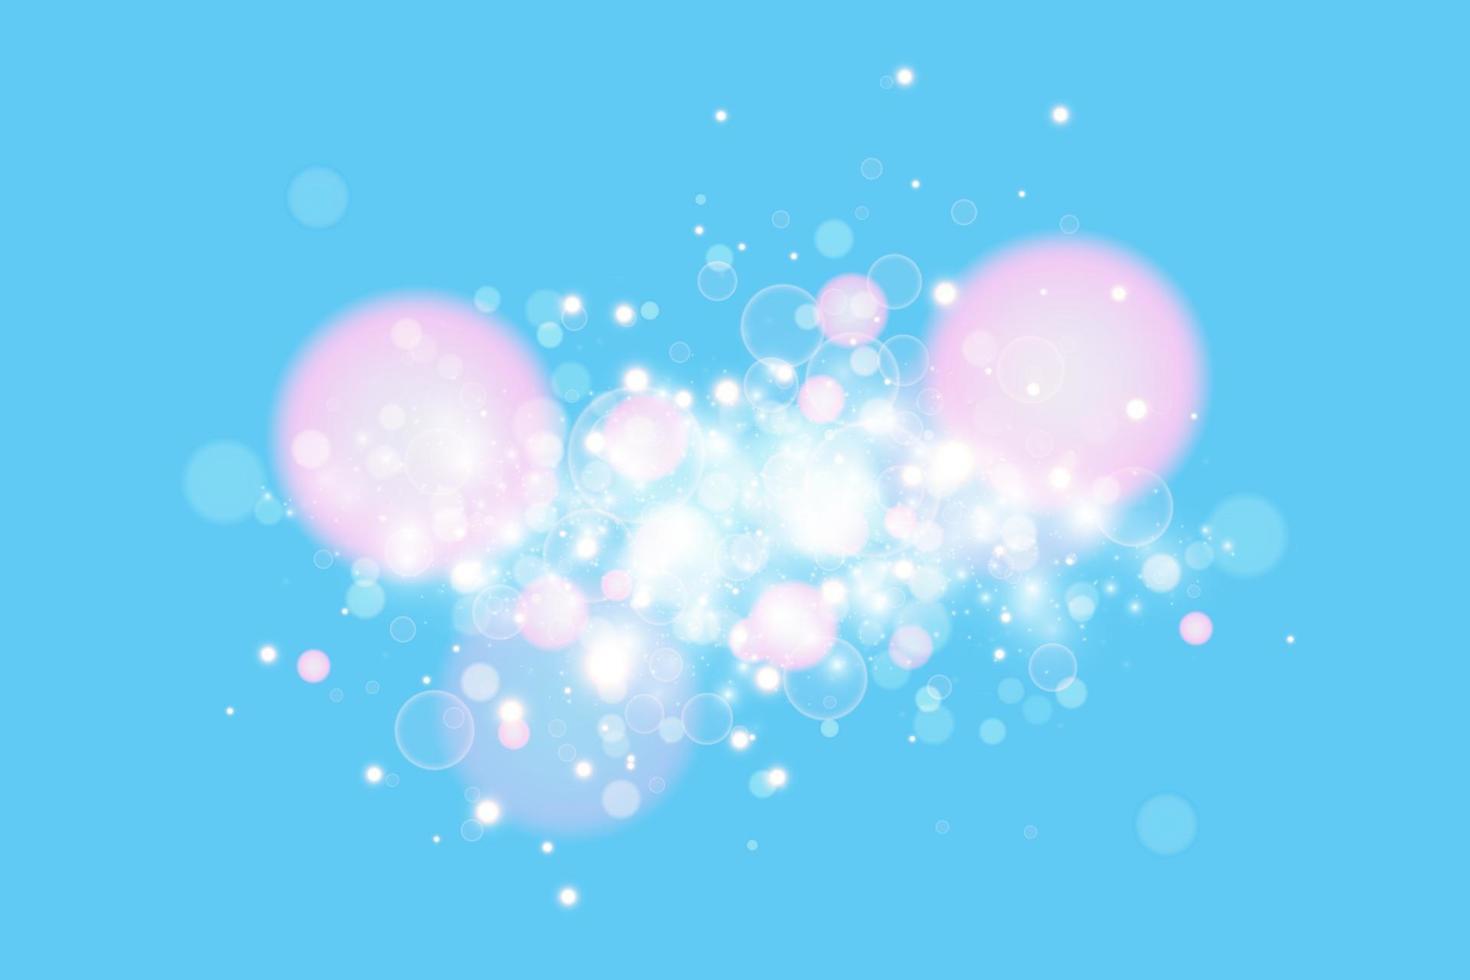 blauwe achtergrond met lichteffect. vector abstracte achtergrond blauwe magische lichten